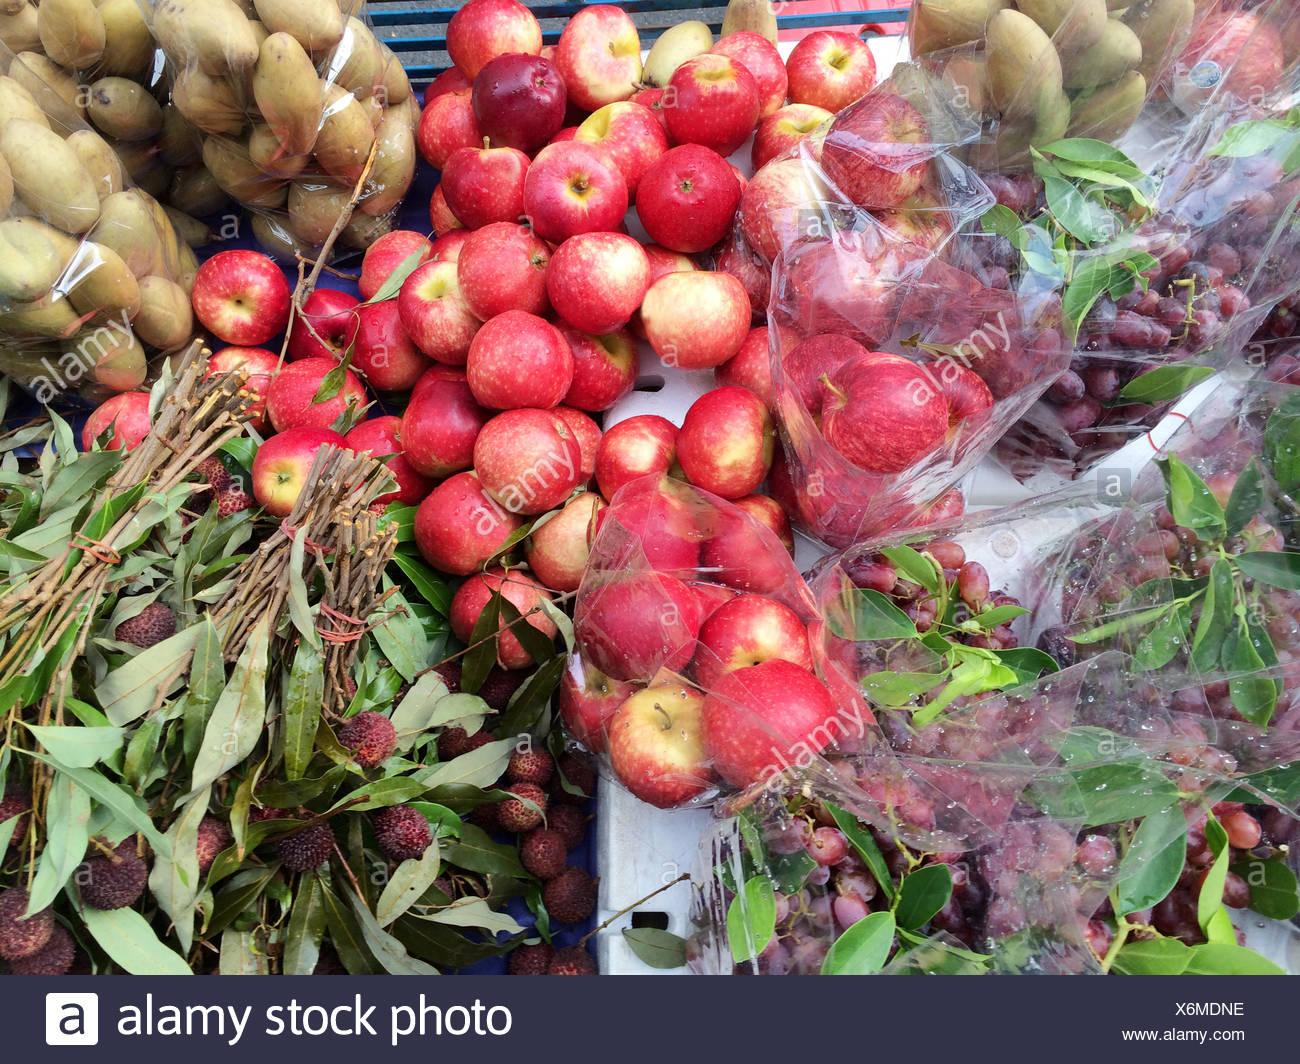 Fruits on market stall - Stock Image